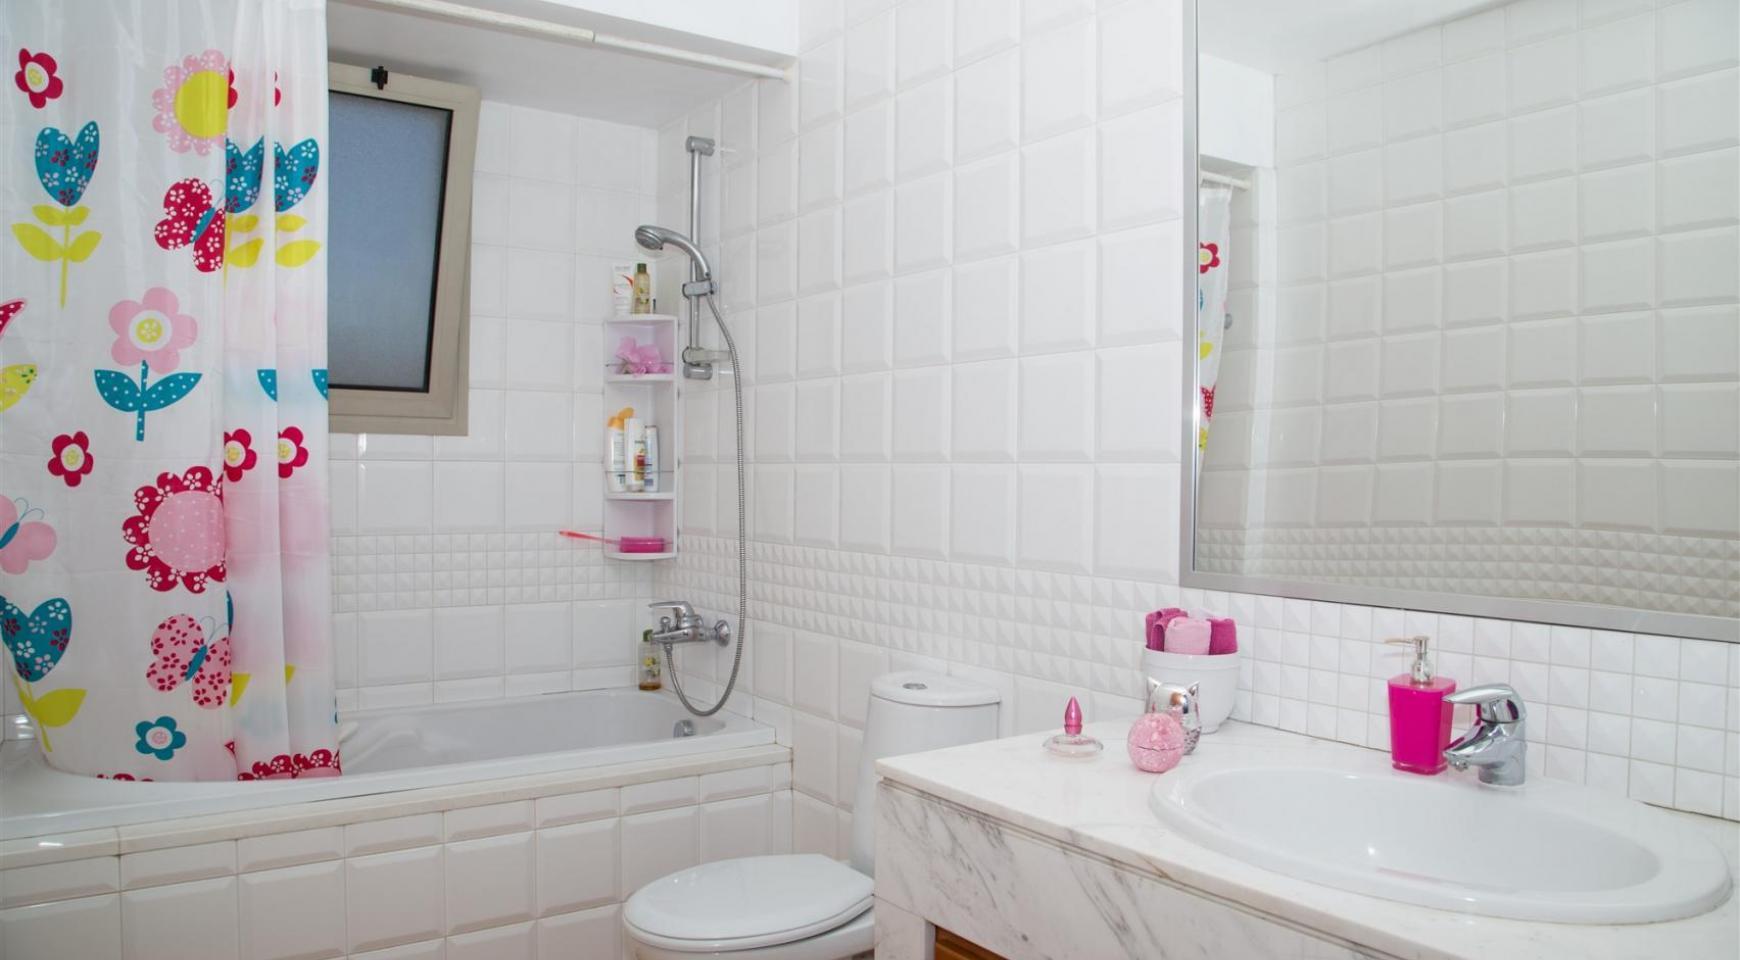 Modern Luxury 4 Bedroom Villa in Sfalagiotisa, Agios Athanasios - 28